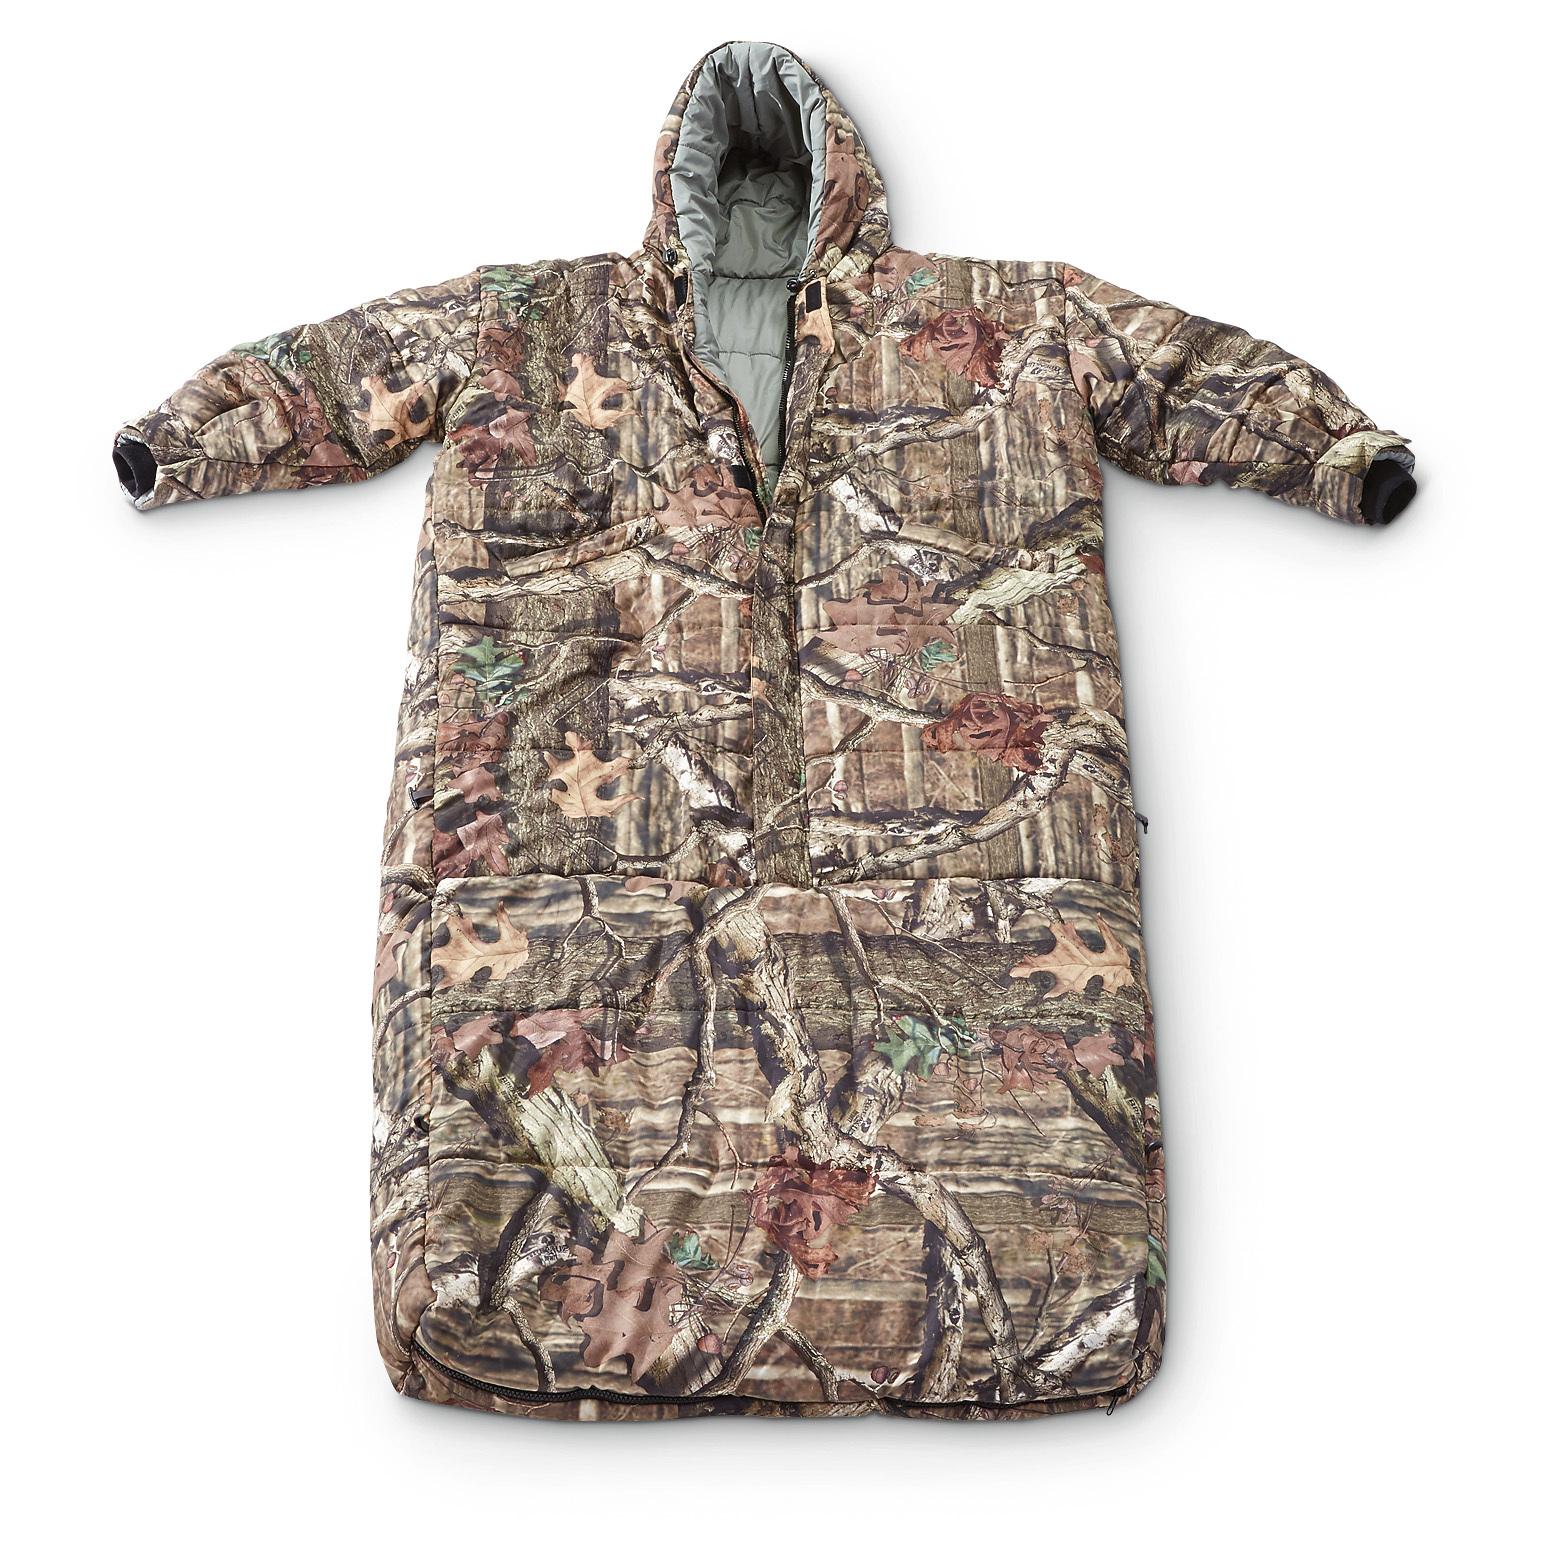 Cheap flannel sleeping bag: guide gear elk 0 degree double canvas bag.